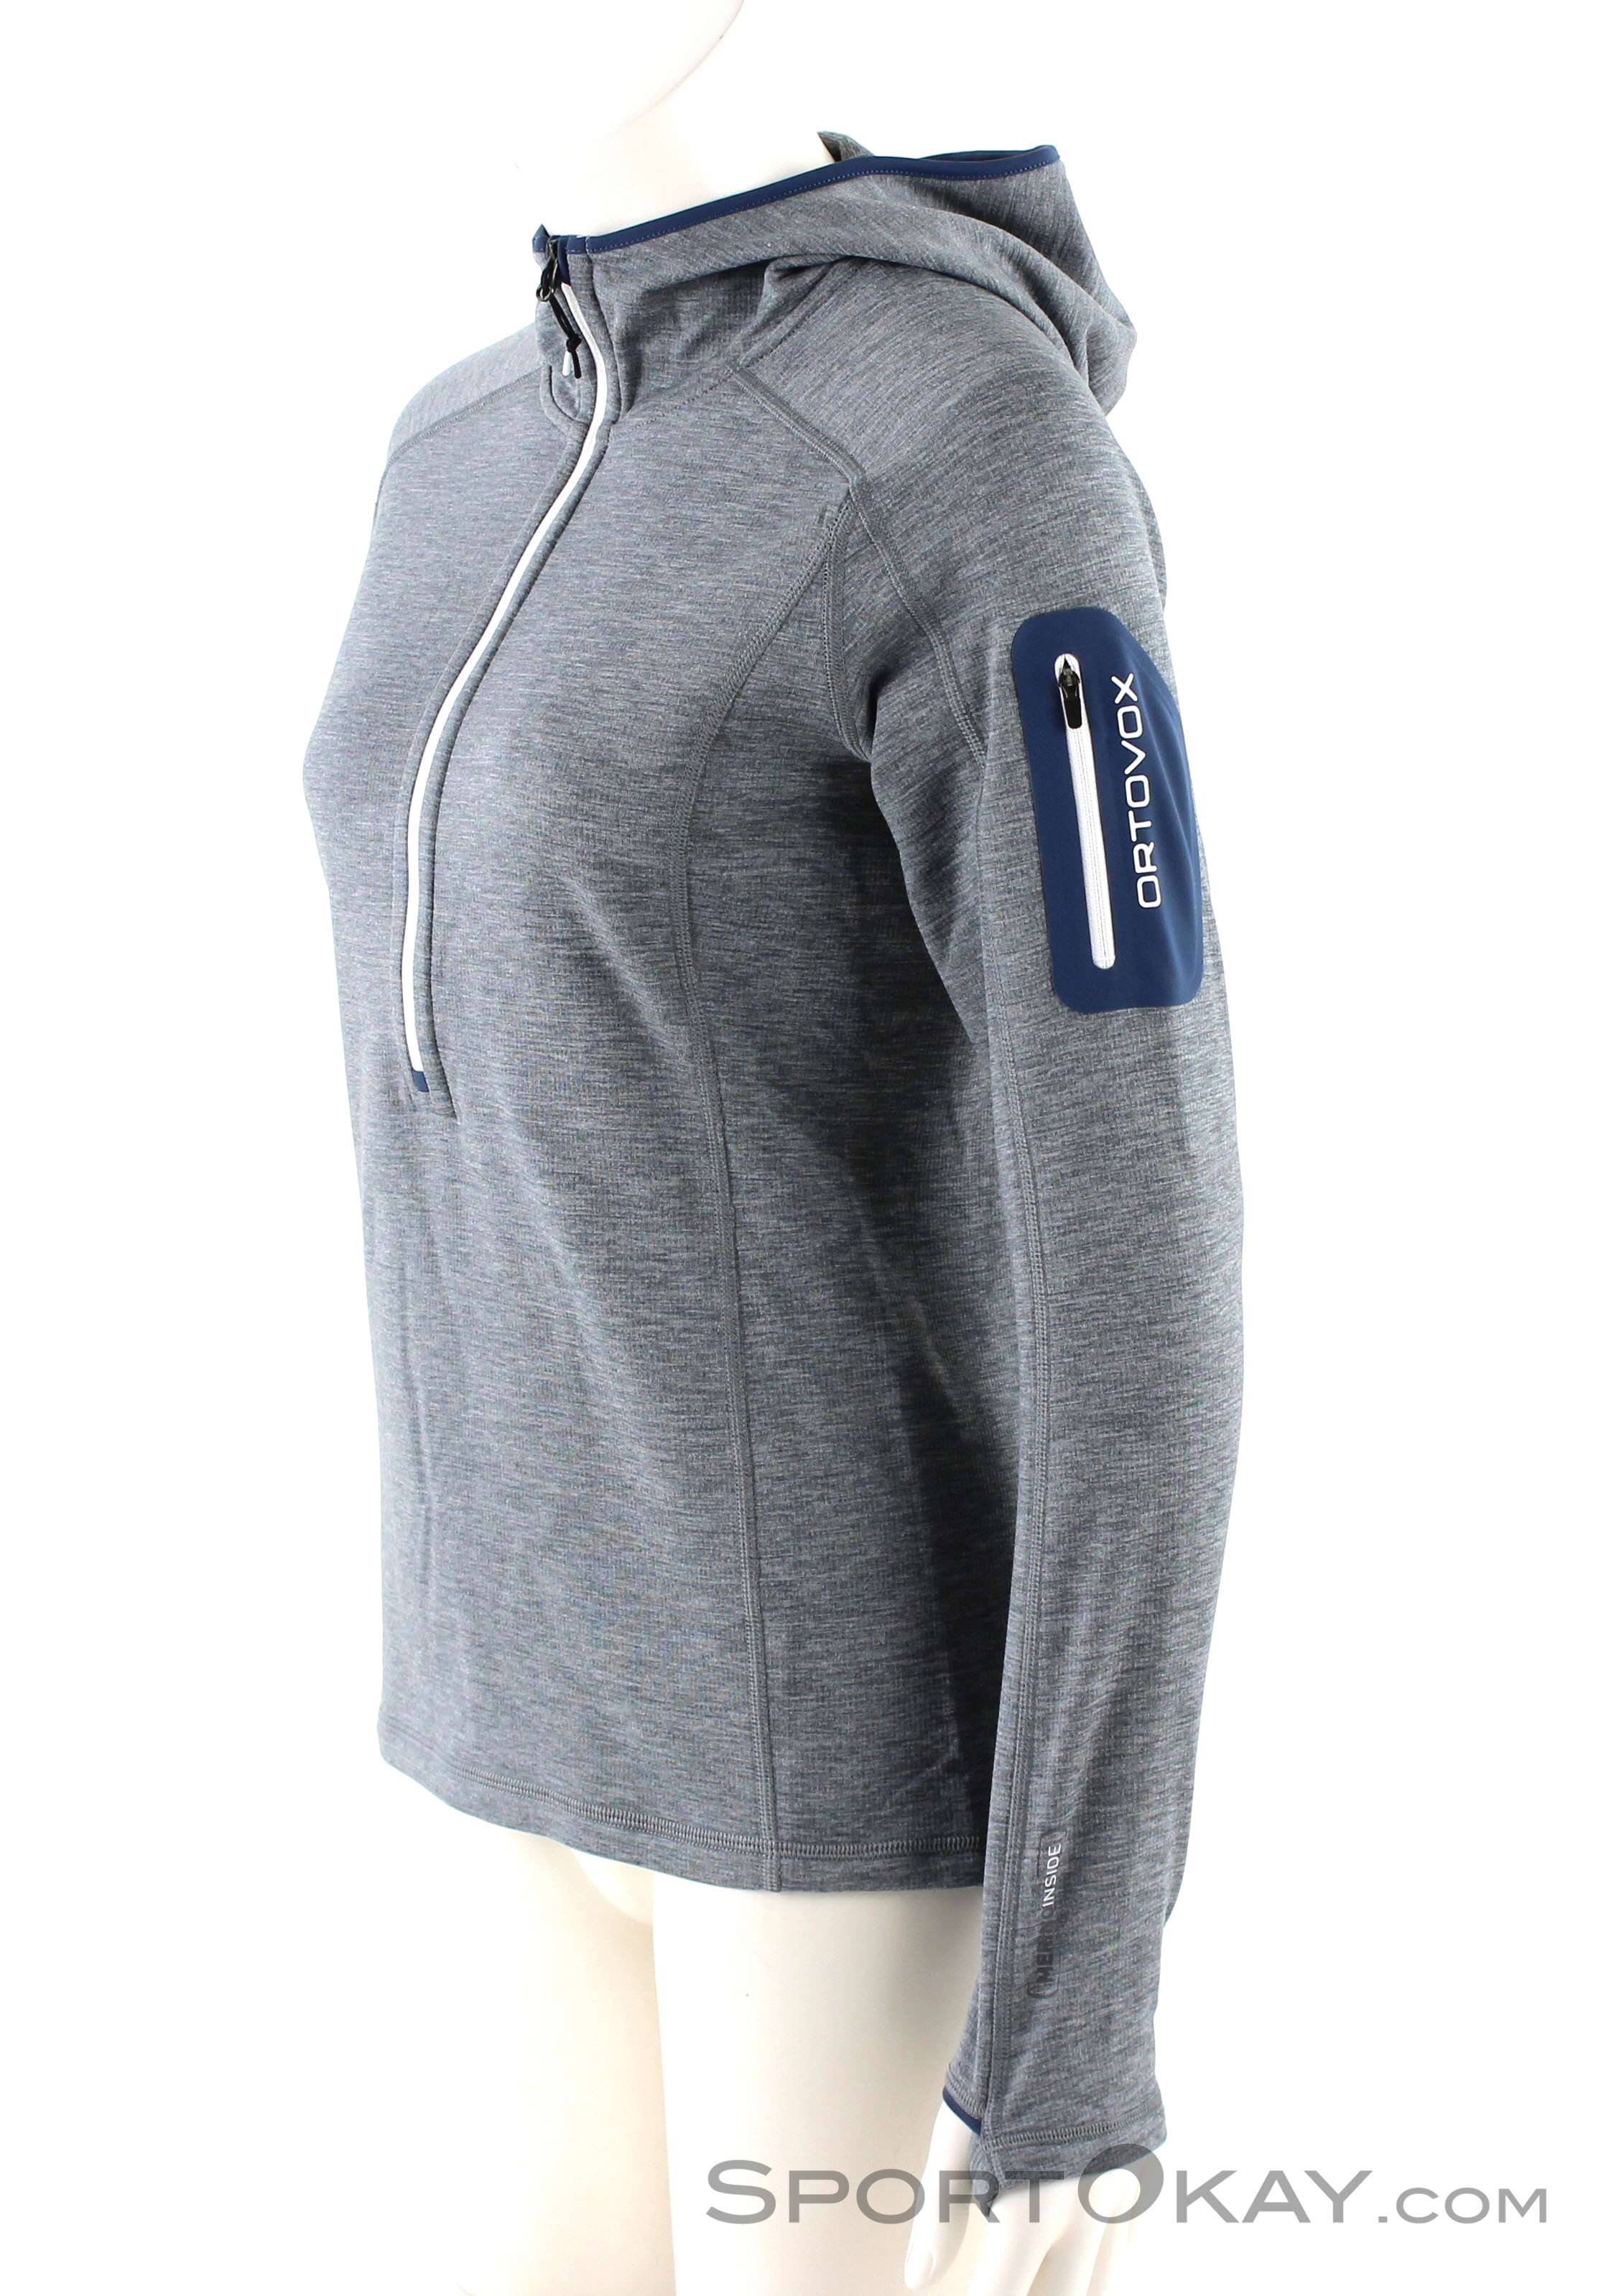 a0fbb3ef564e7 Ortovox Fleece Light Melange Zneck Womens Fleece Jacket - Sweaters ...